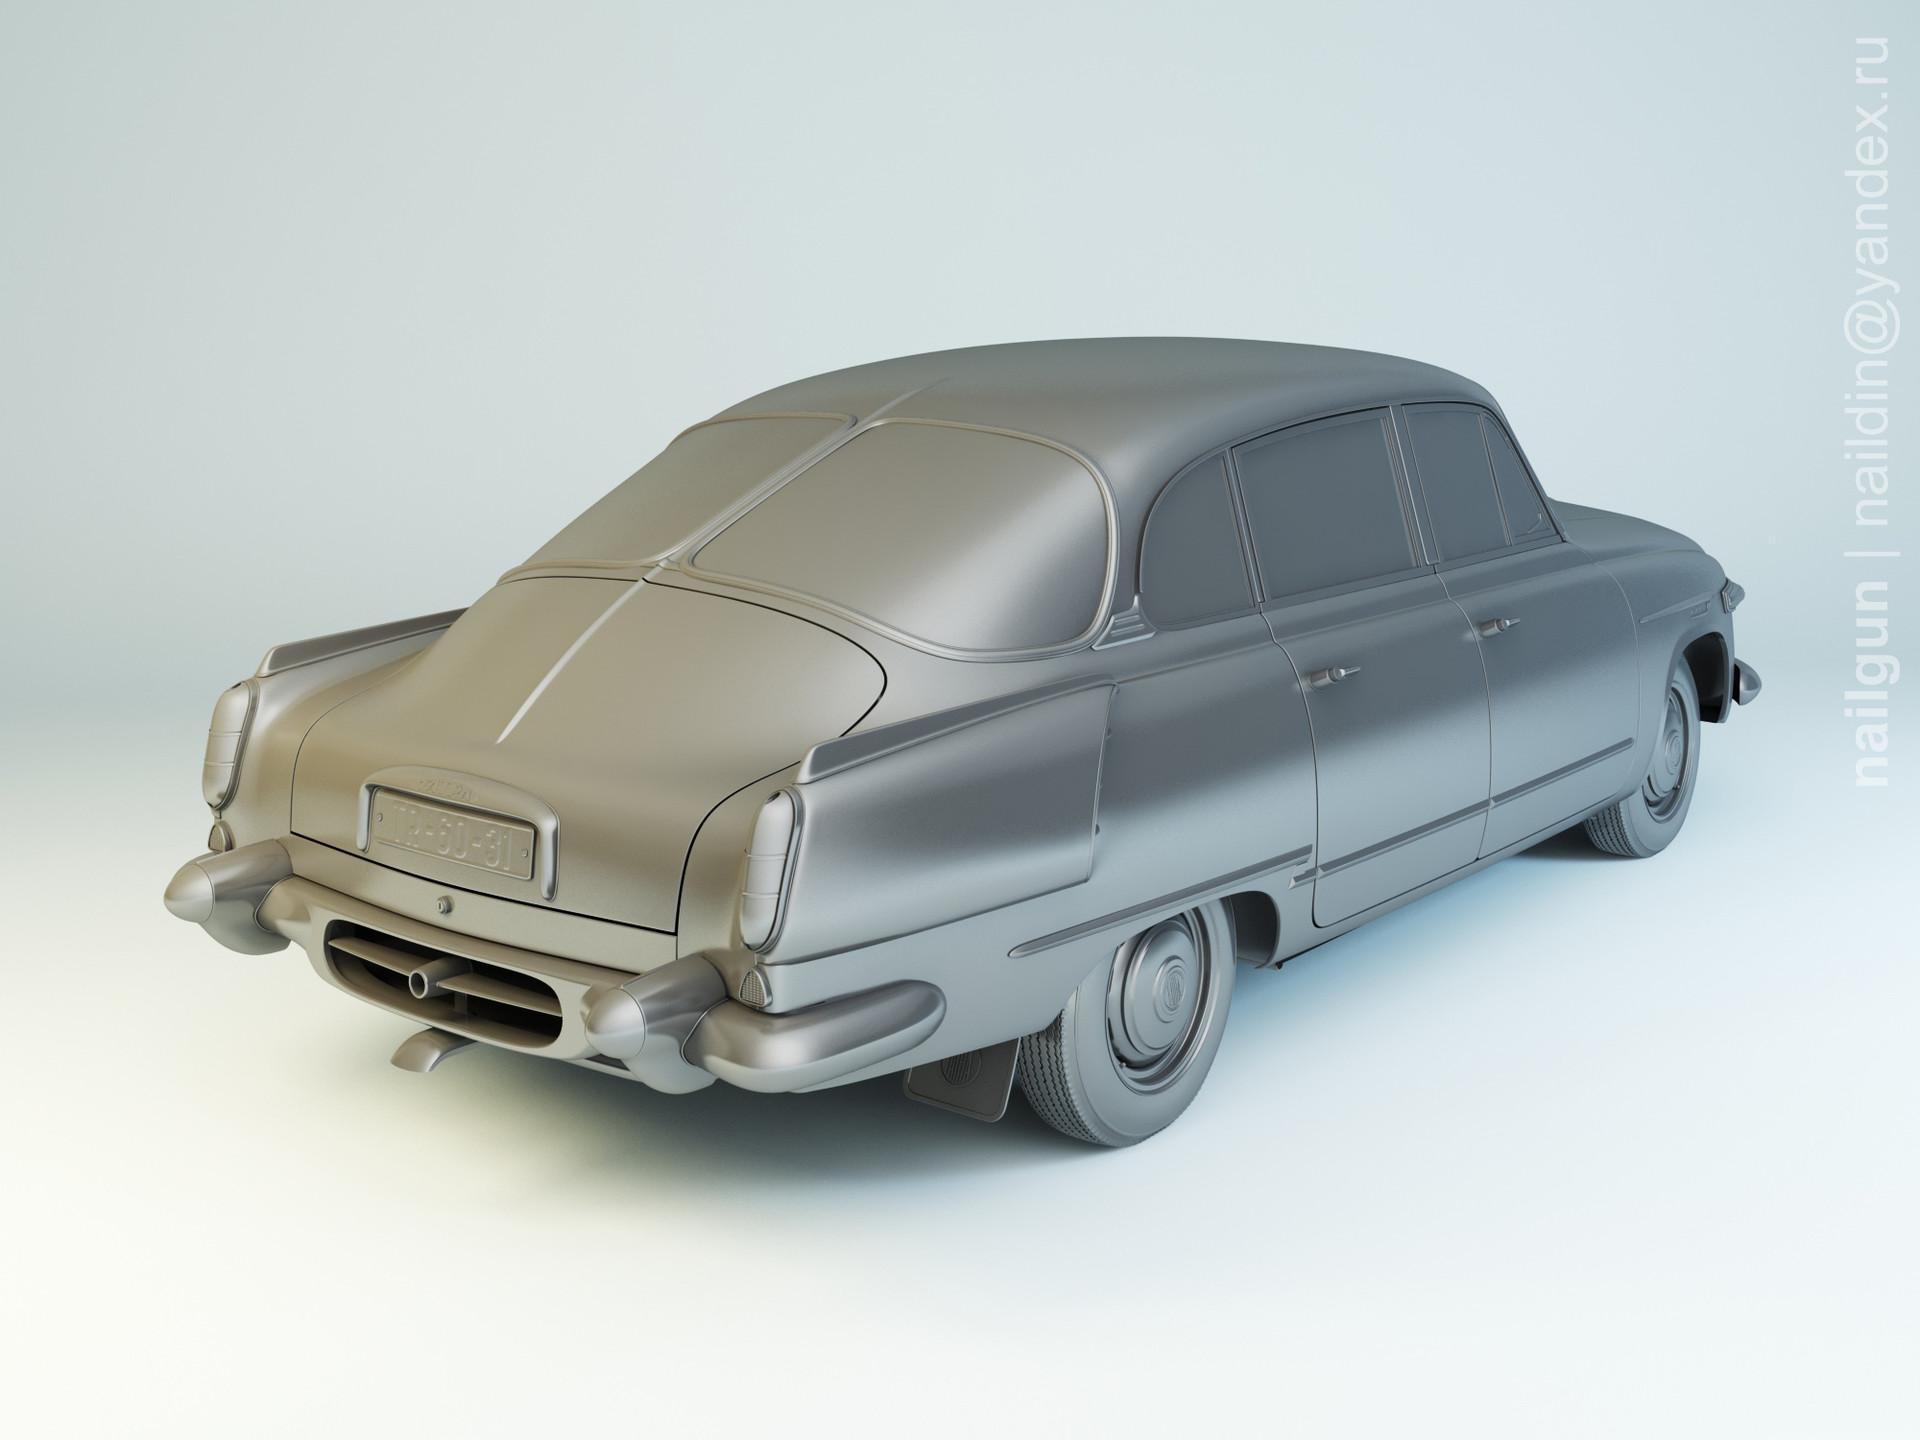 Nail khusnutdinov als 155 003 tatra 603 1 modelling 1